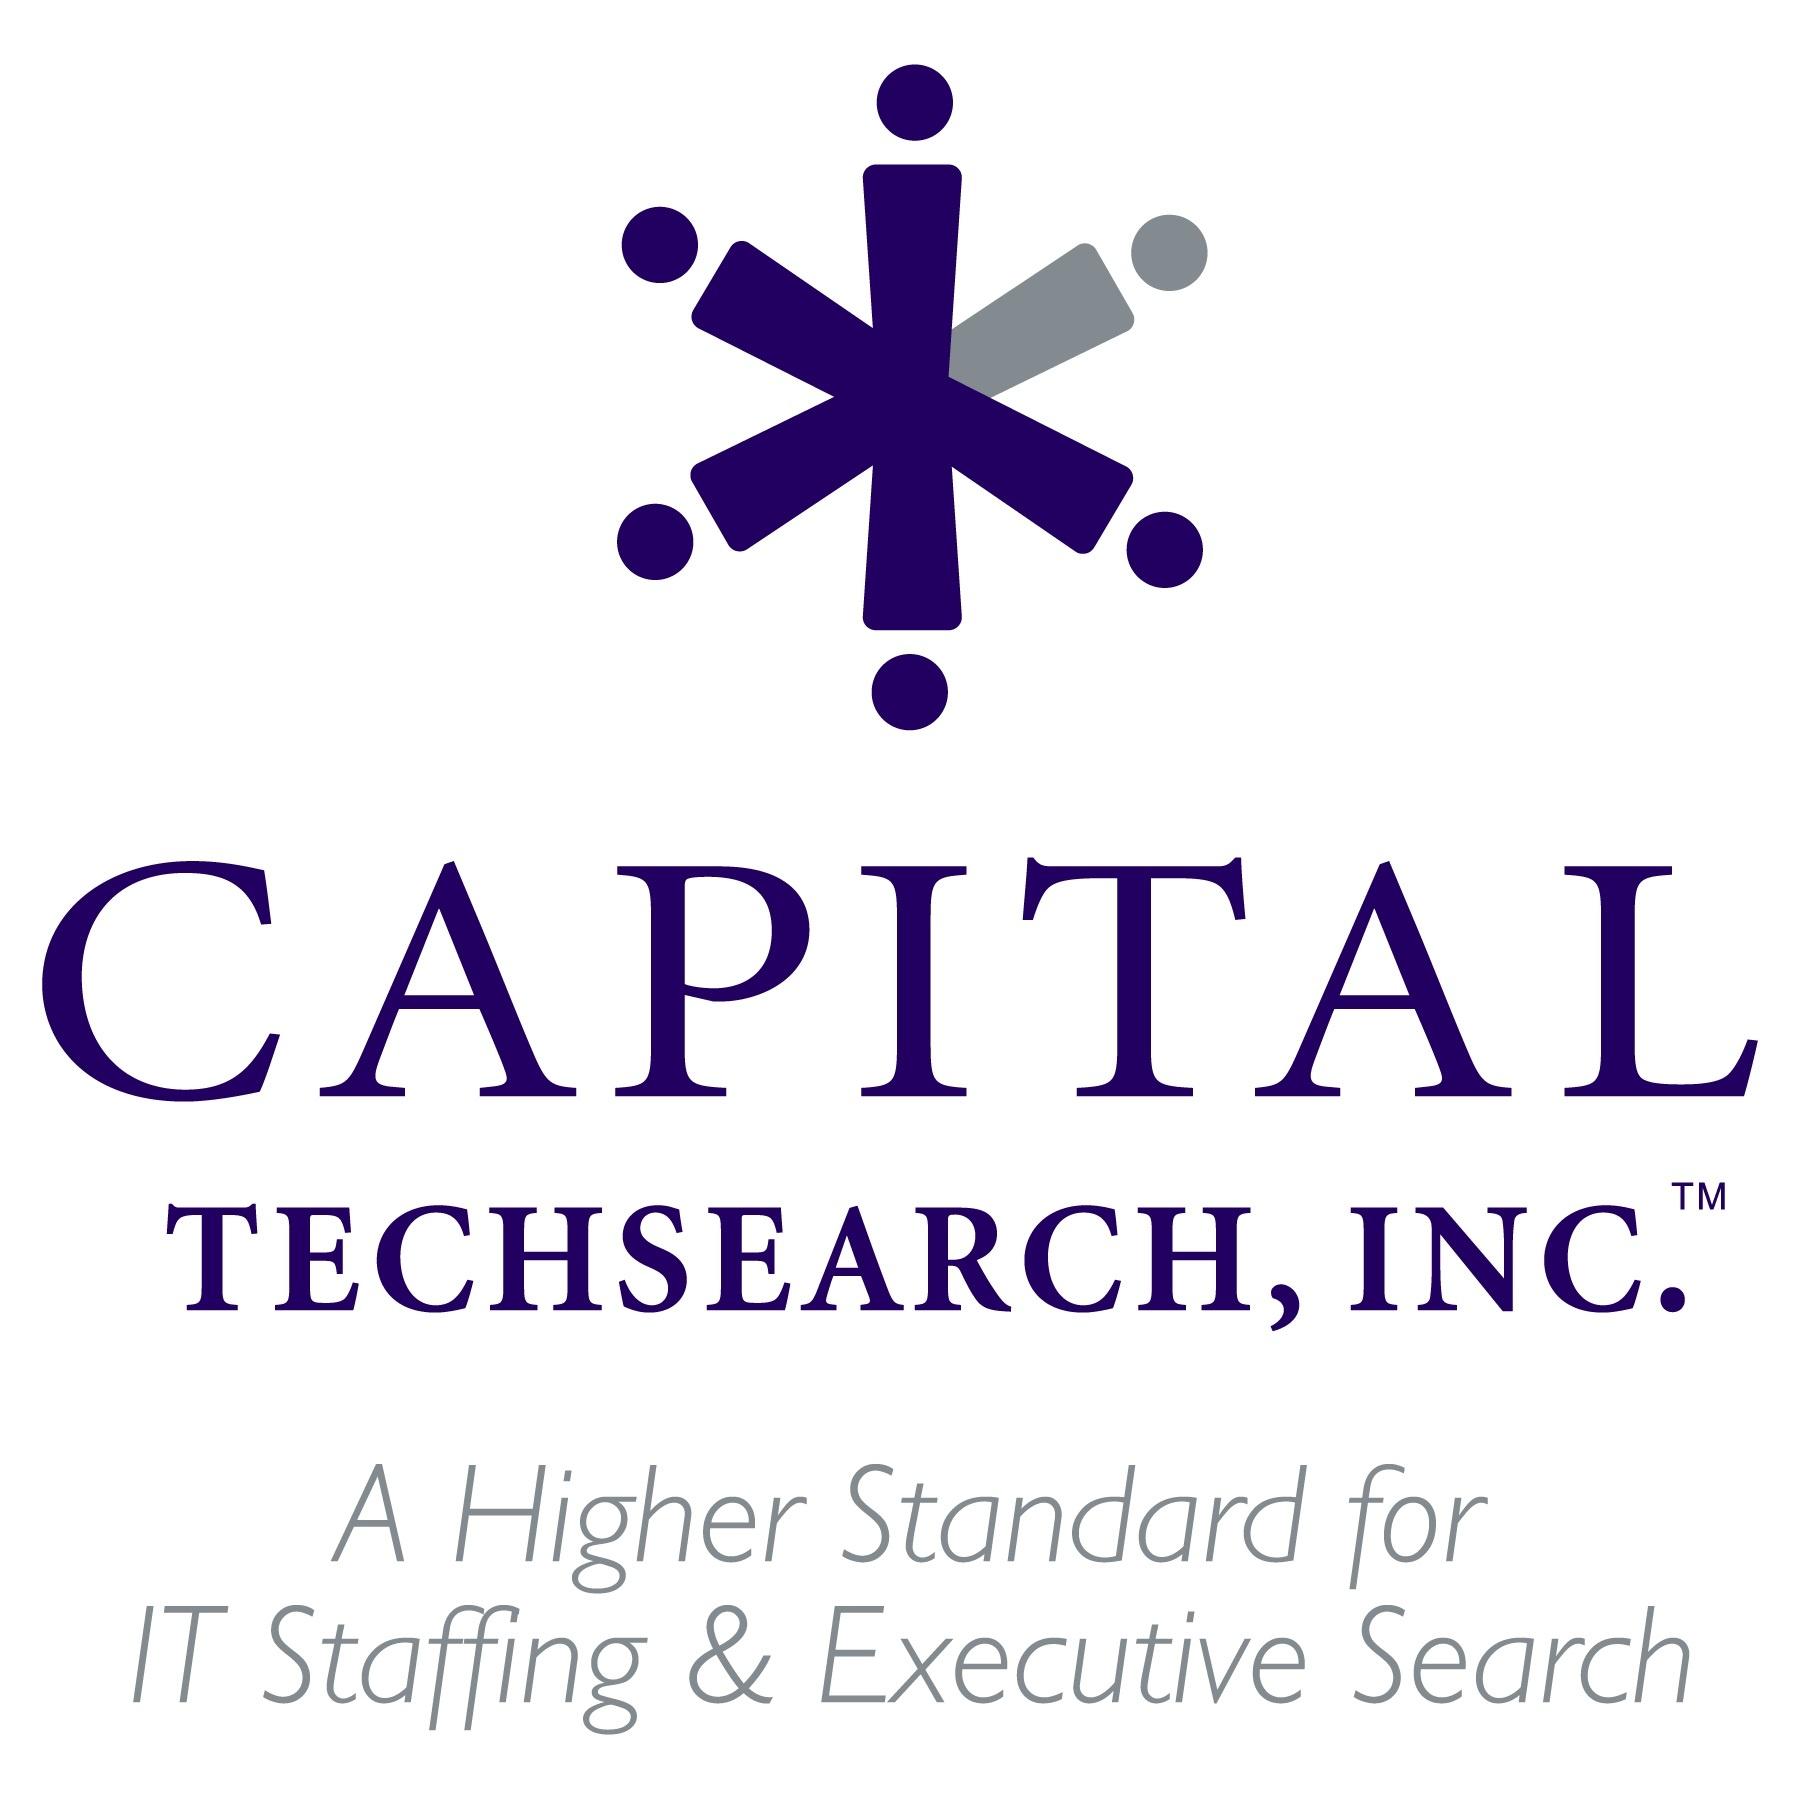 capitaltechsearch-tagline.jpg